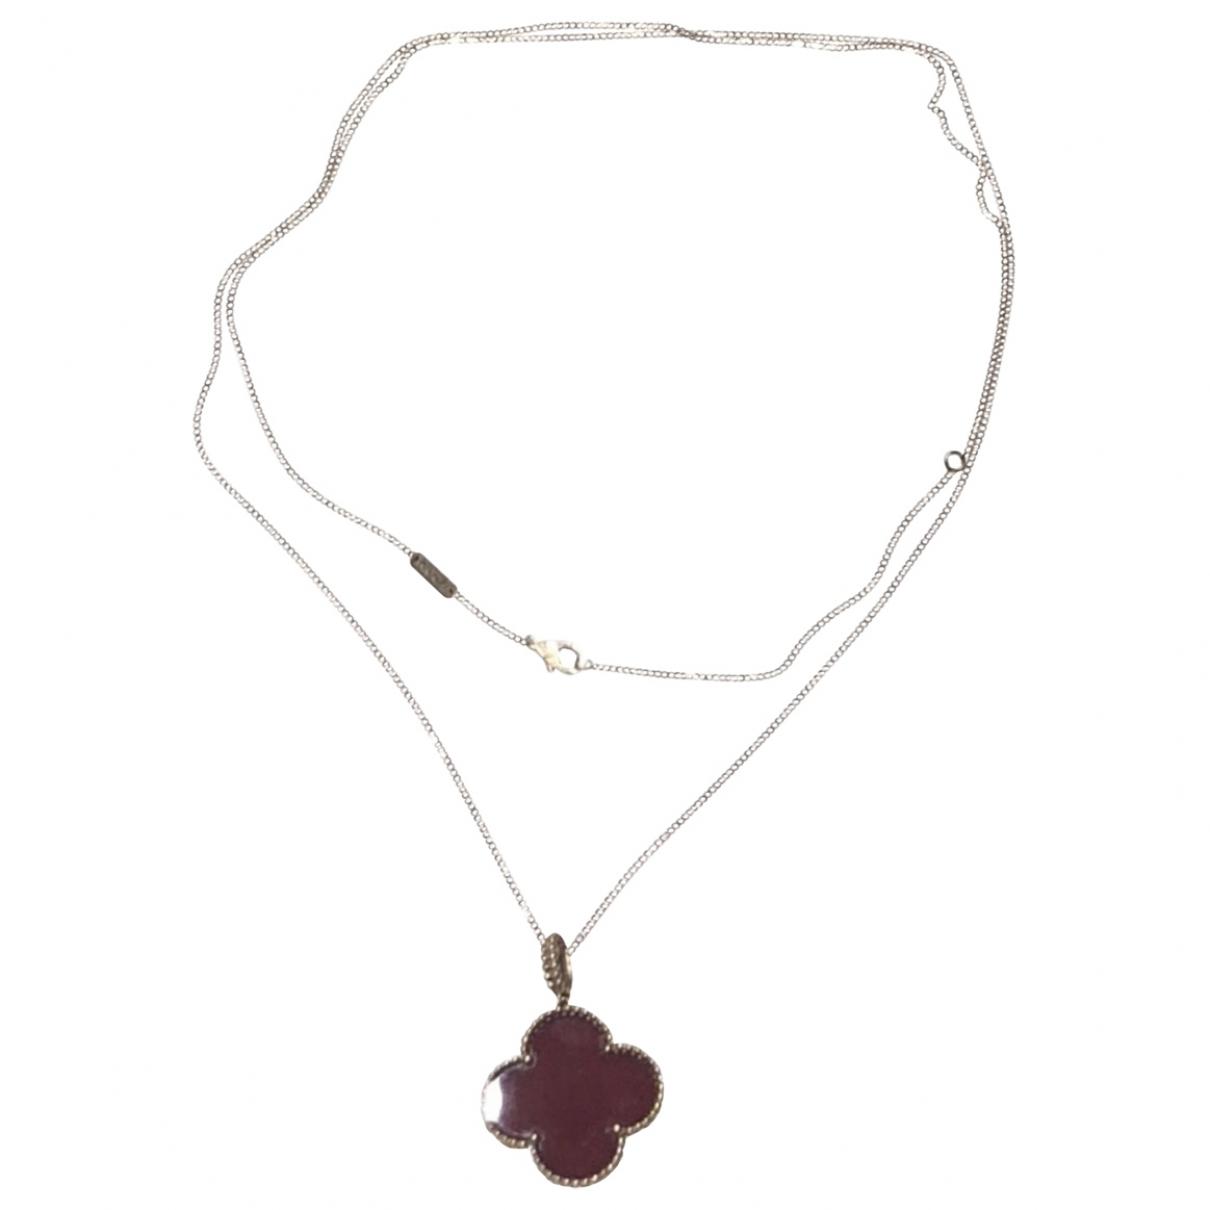 Van Cleef & Arpels - Collier Magic Alhambra pour femme en or rose - rouge